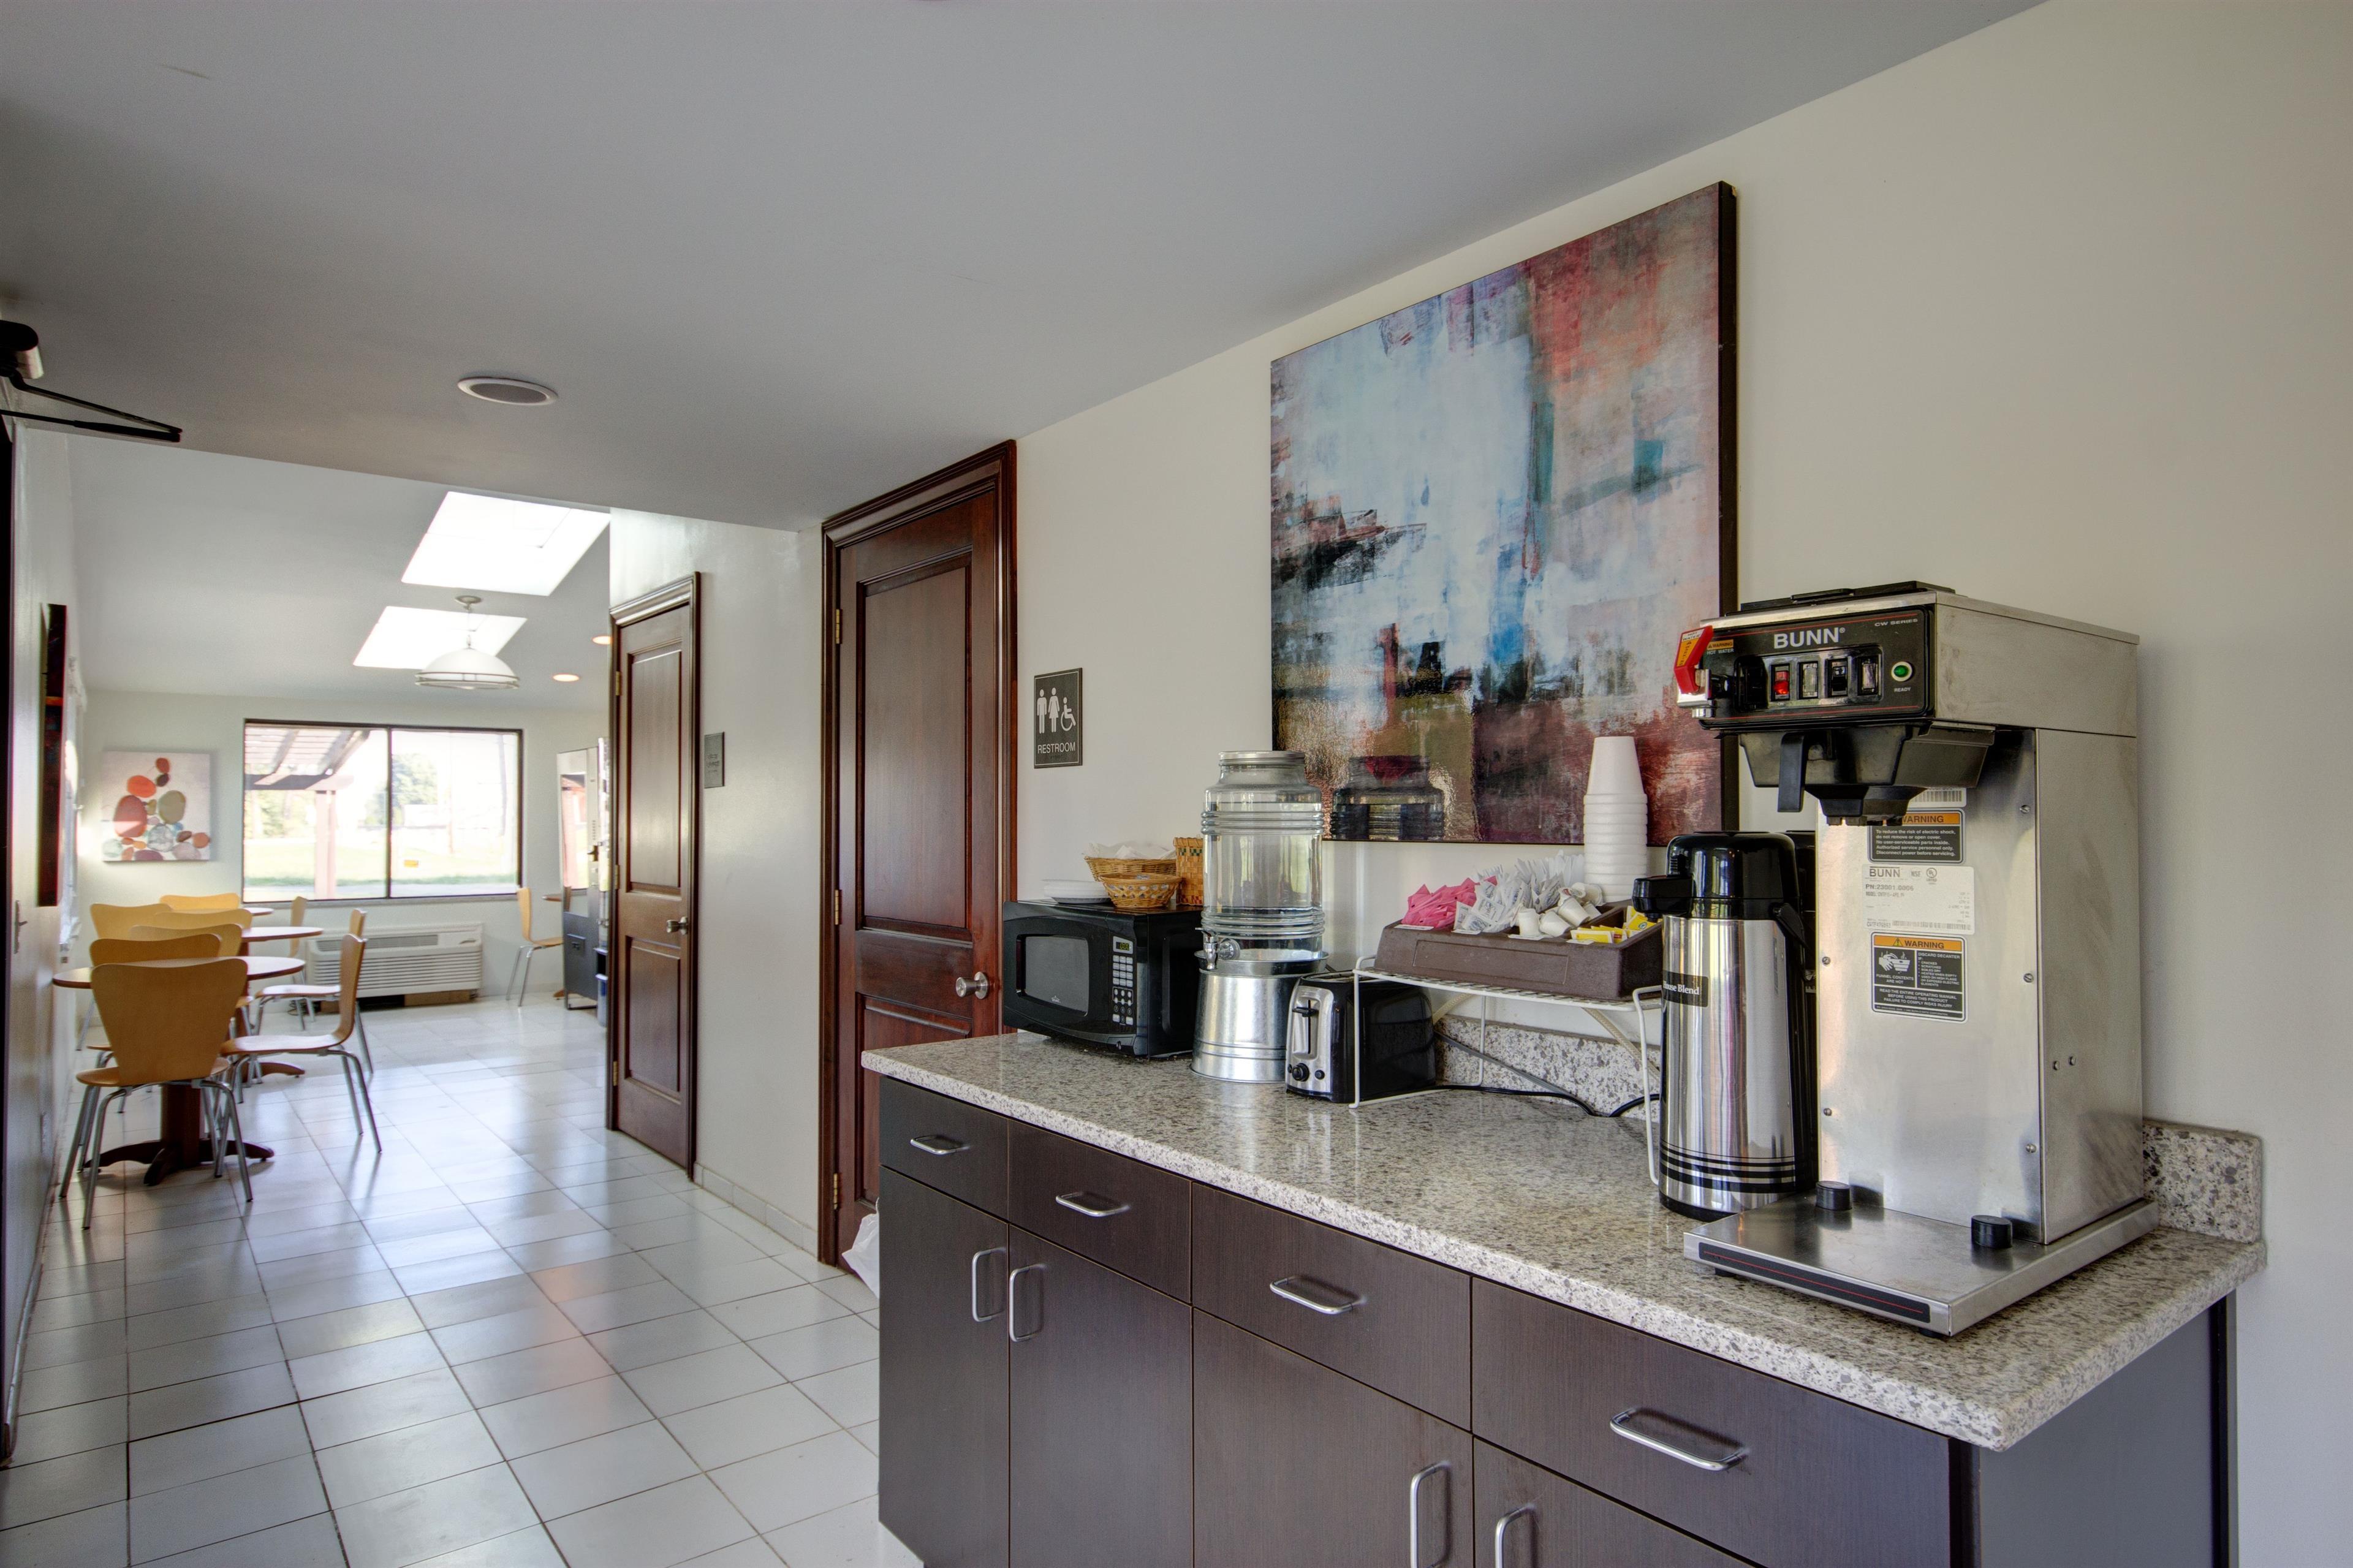 Americas Best Value Inn - Heath/Newark image 7